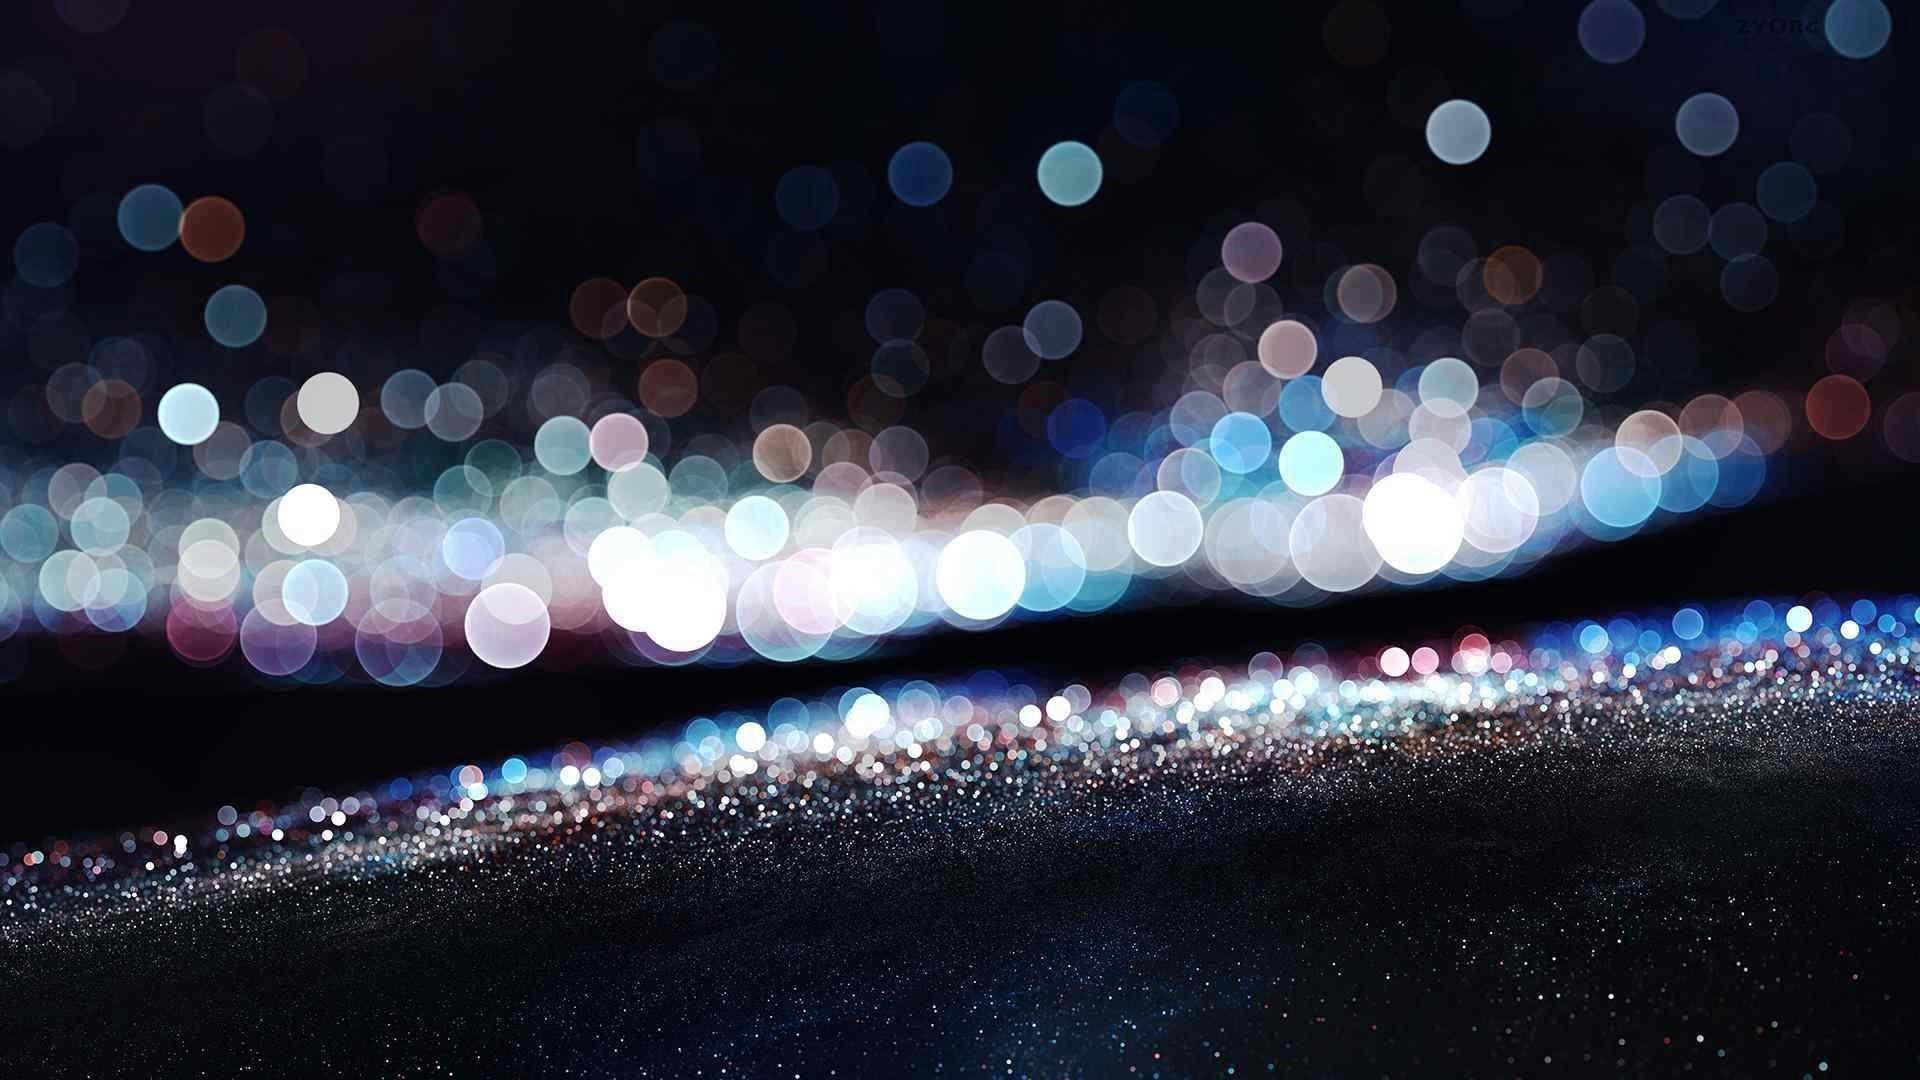 Bokeh The Glitters on The Ground Free Desktop Wallpaper